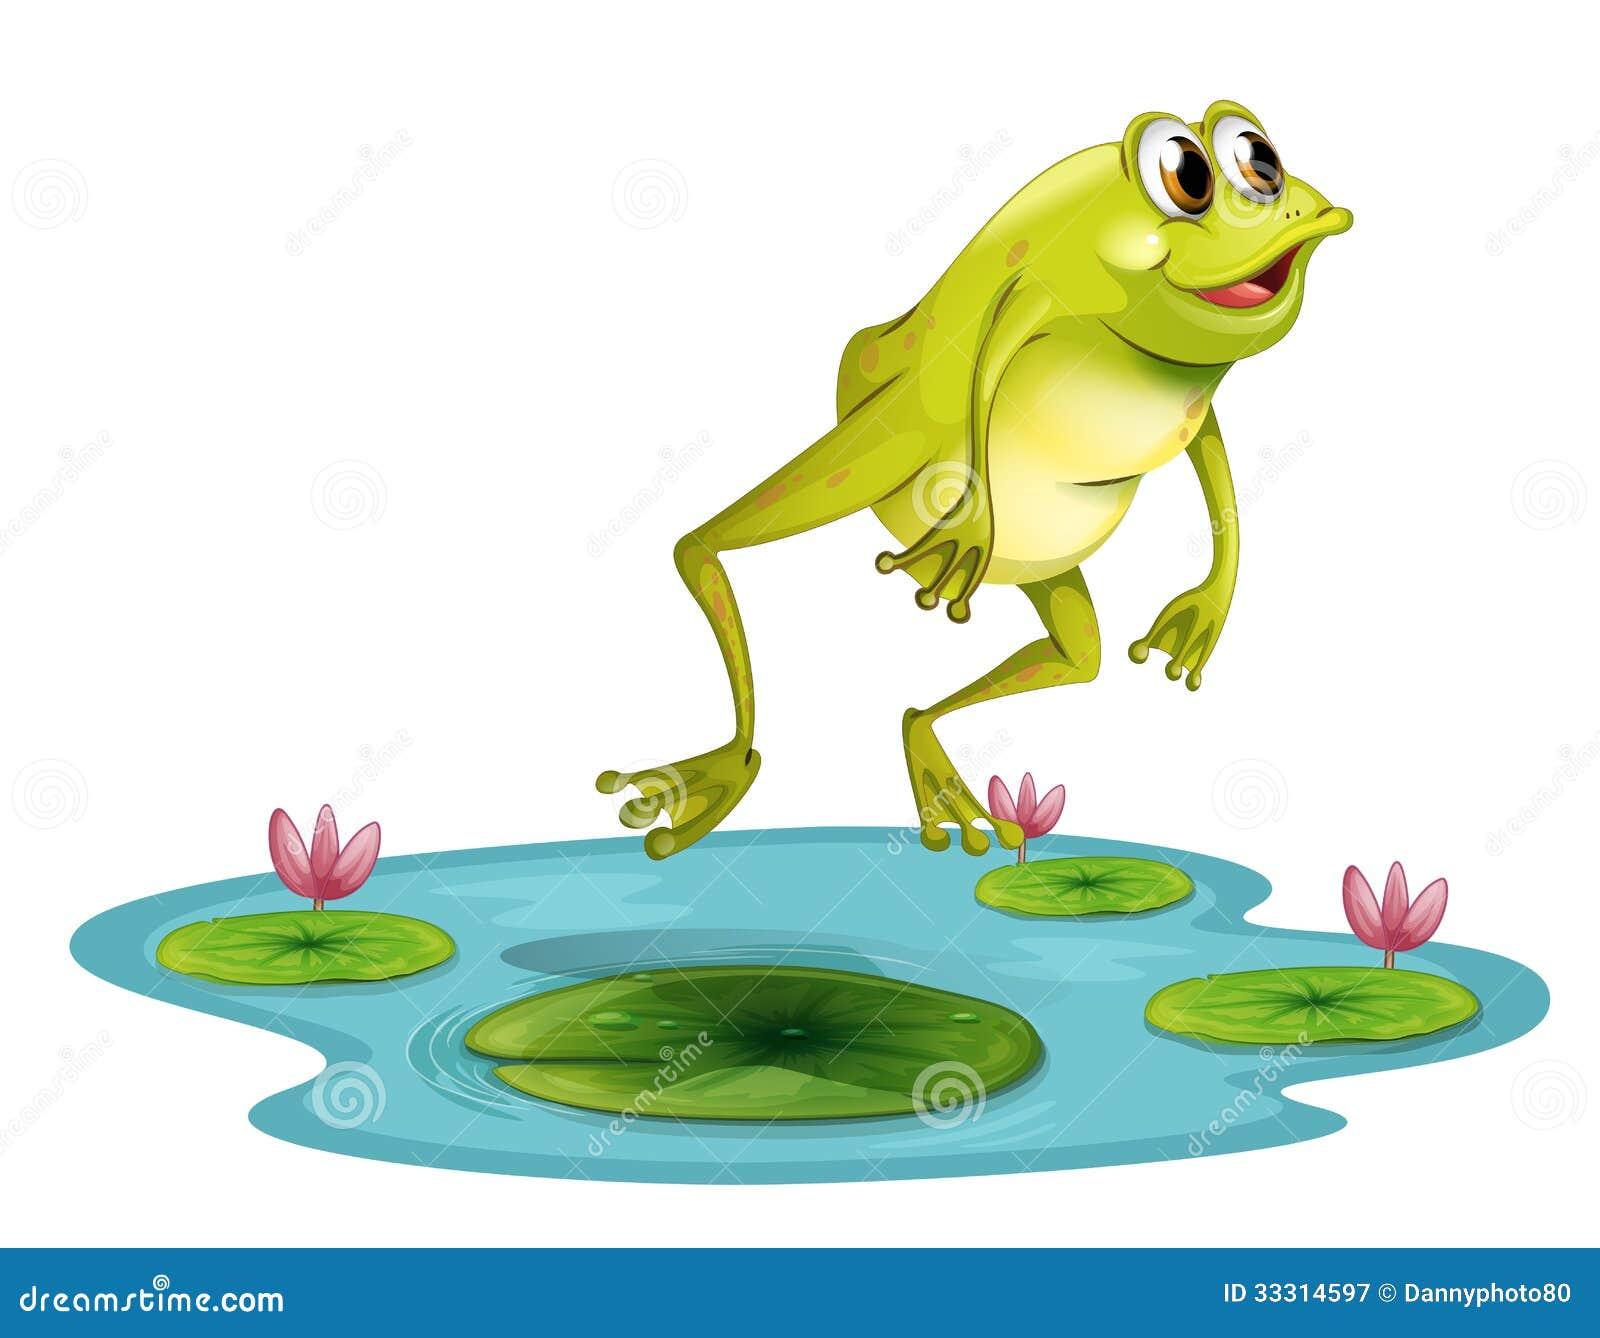 Jumping frog animation - photo#25